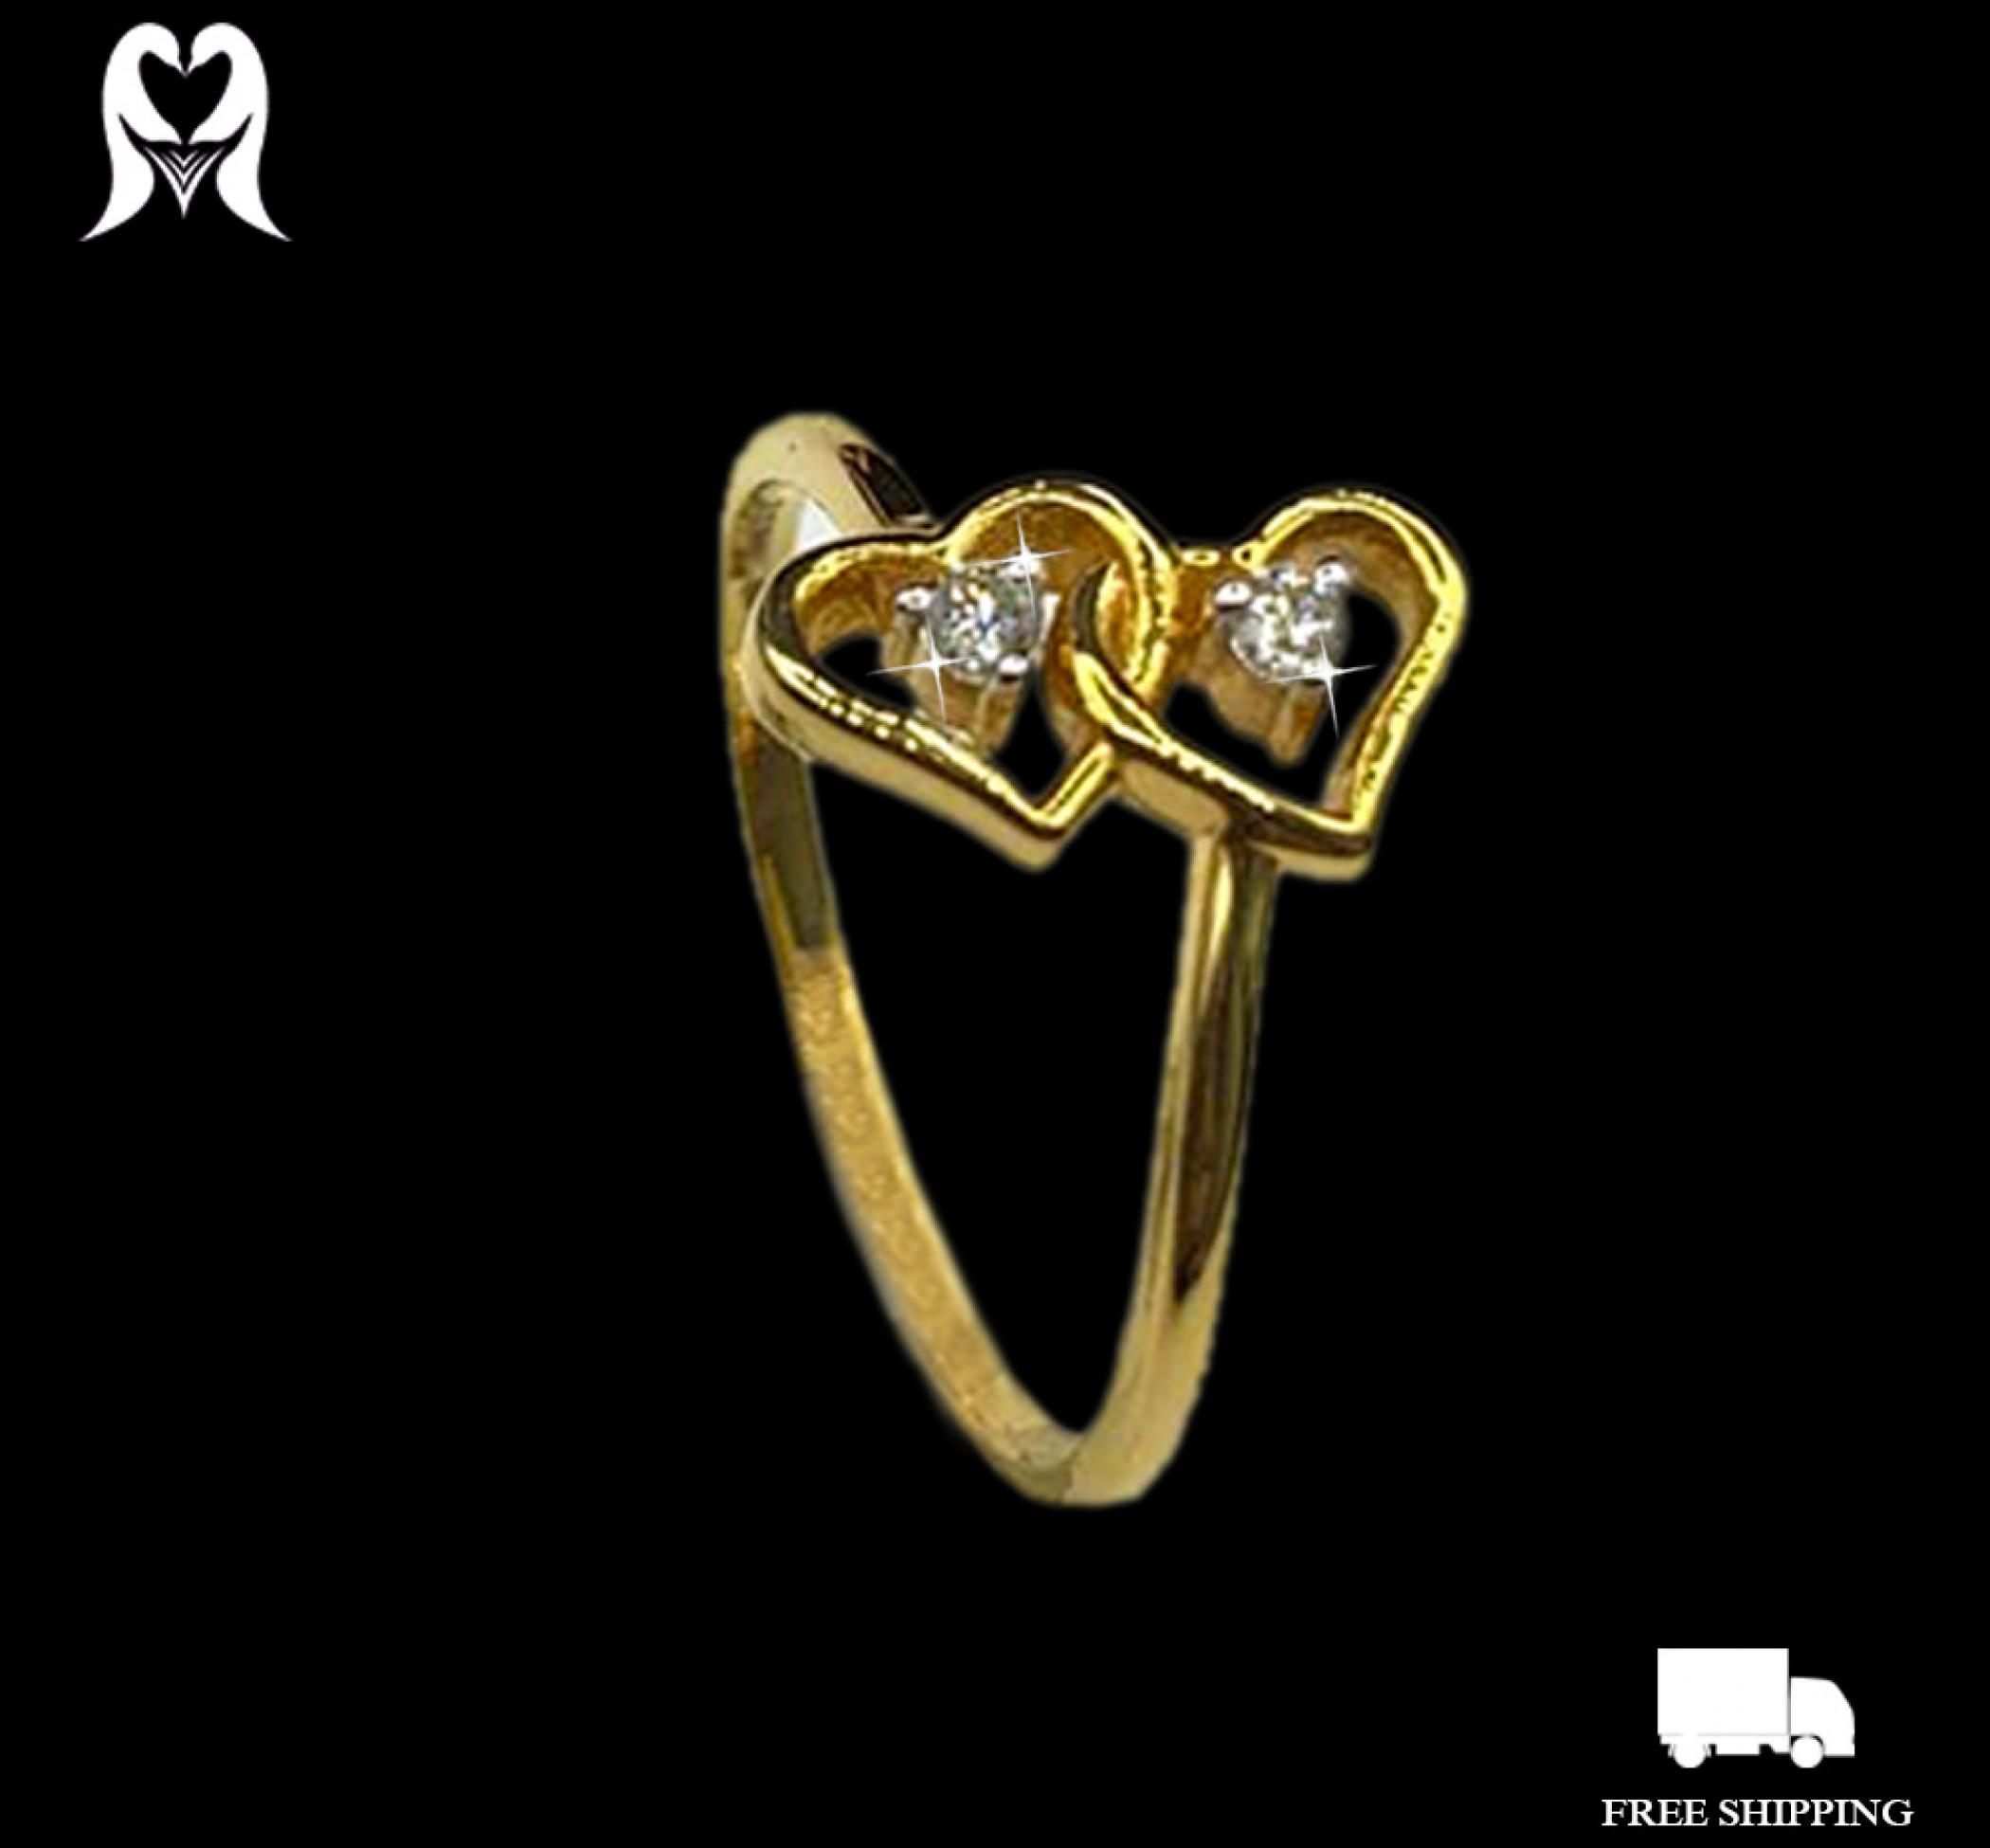 Diamond Ring 0.05 CTS 2 PCS J12158 [2.04g - 2030889]